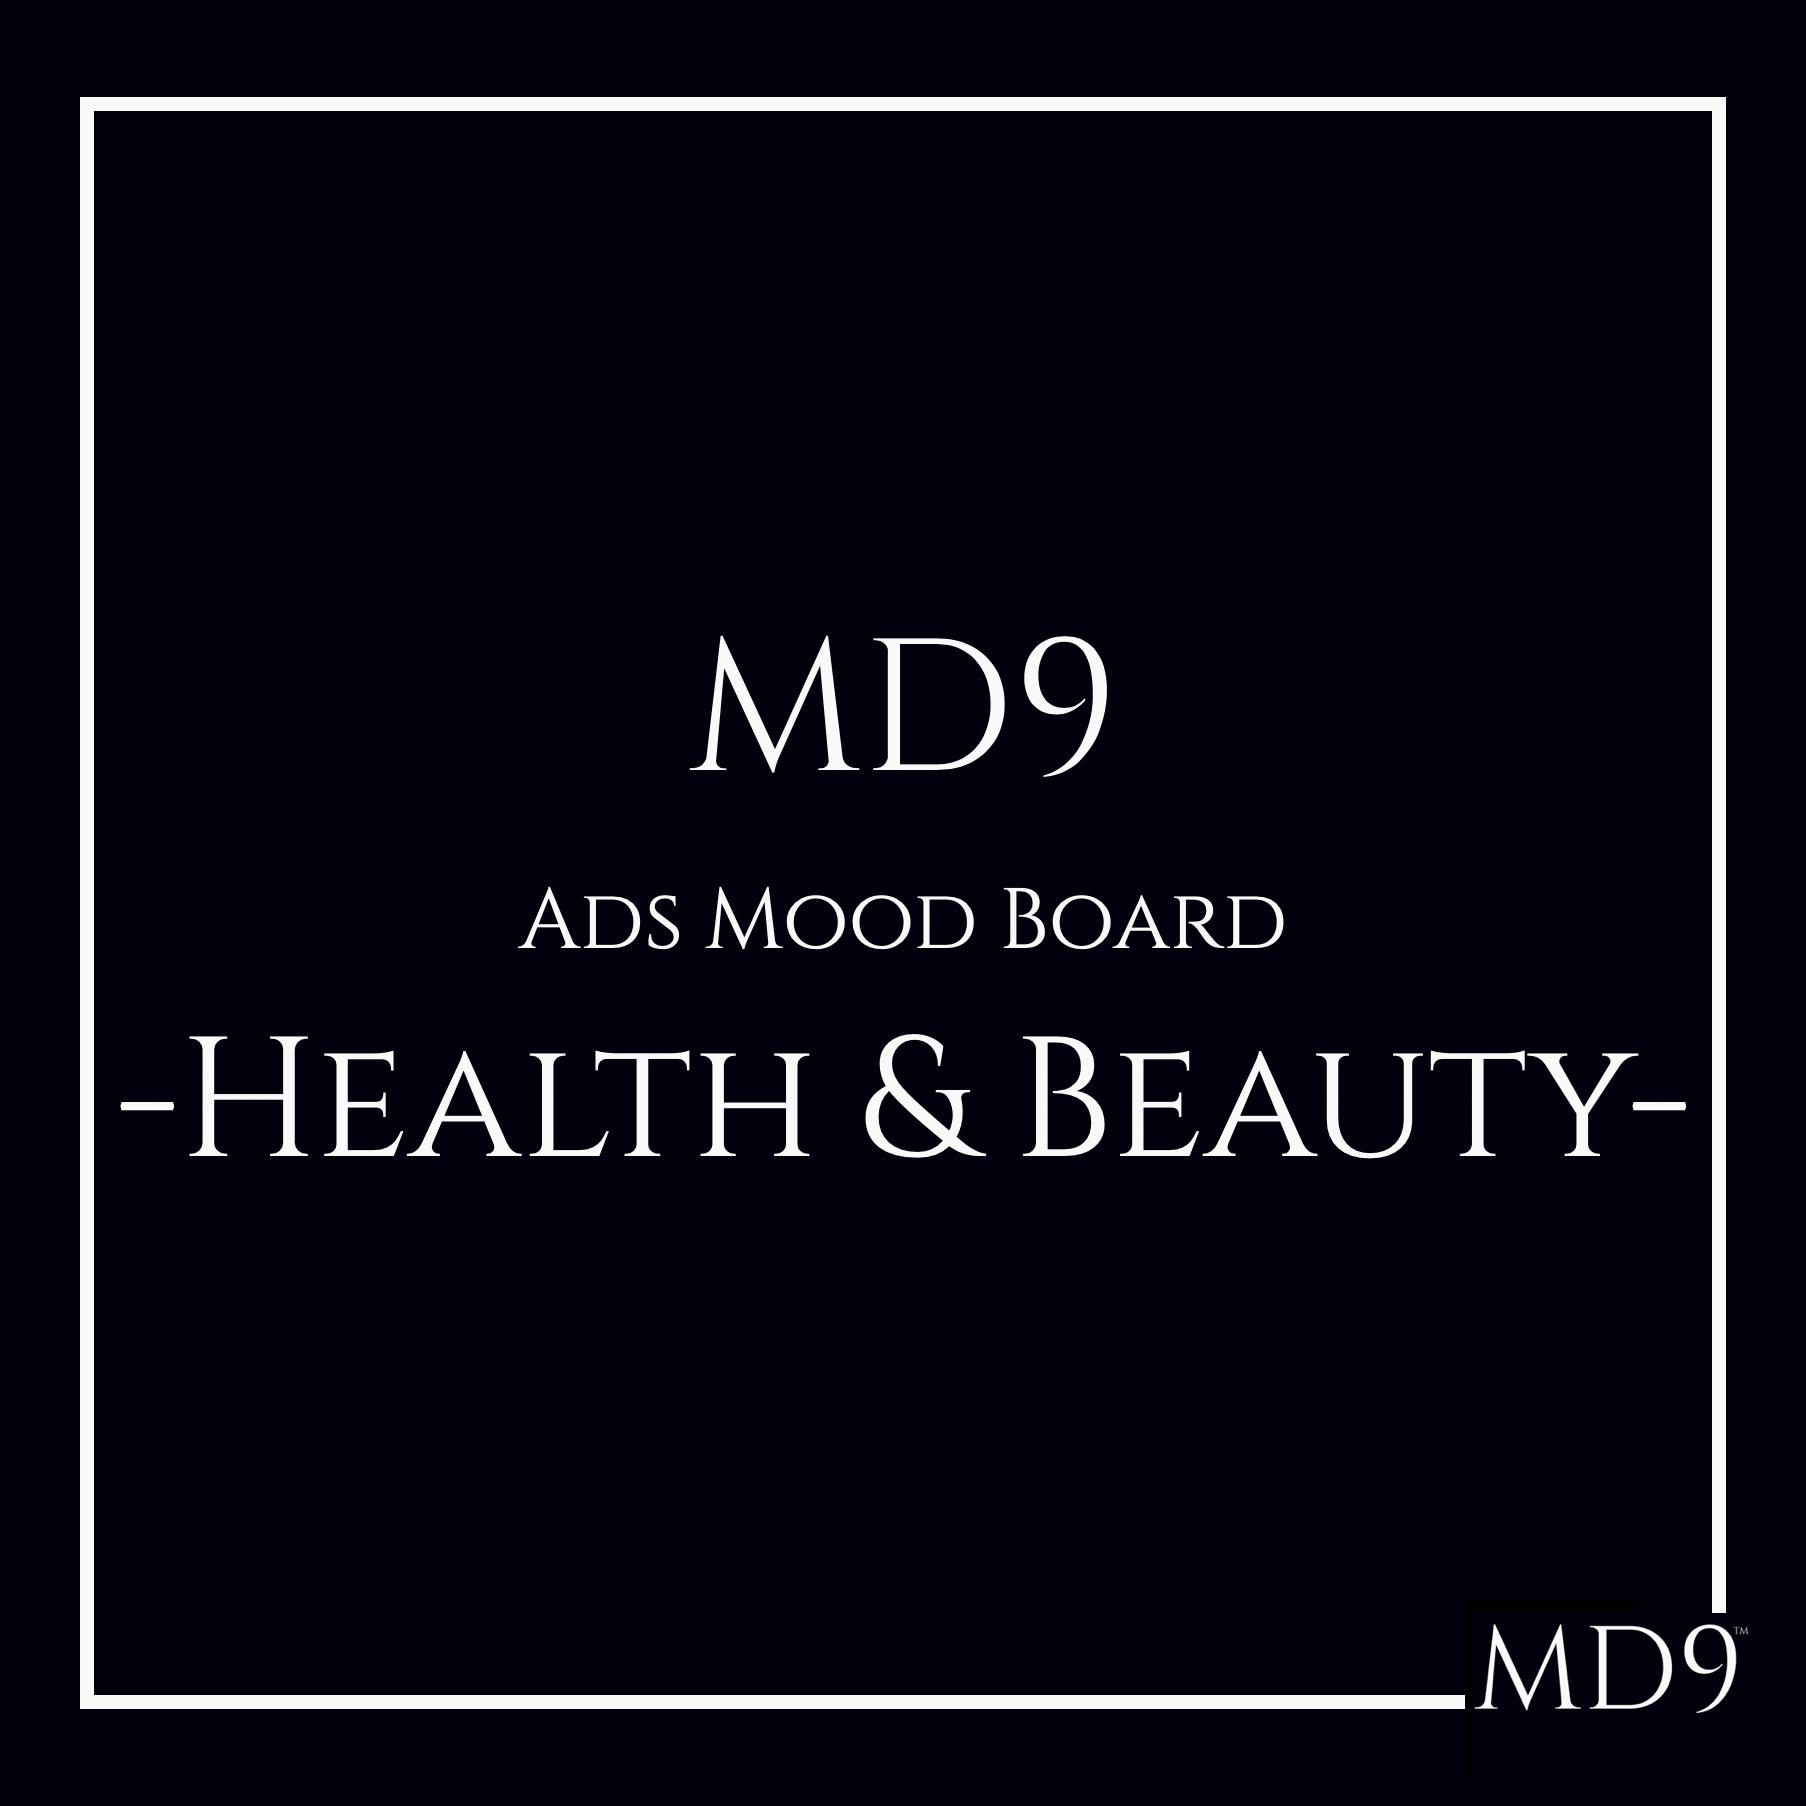 MD9's Ads Mood Board – Health & Beauty